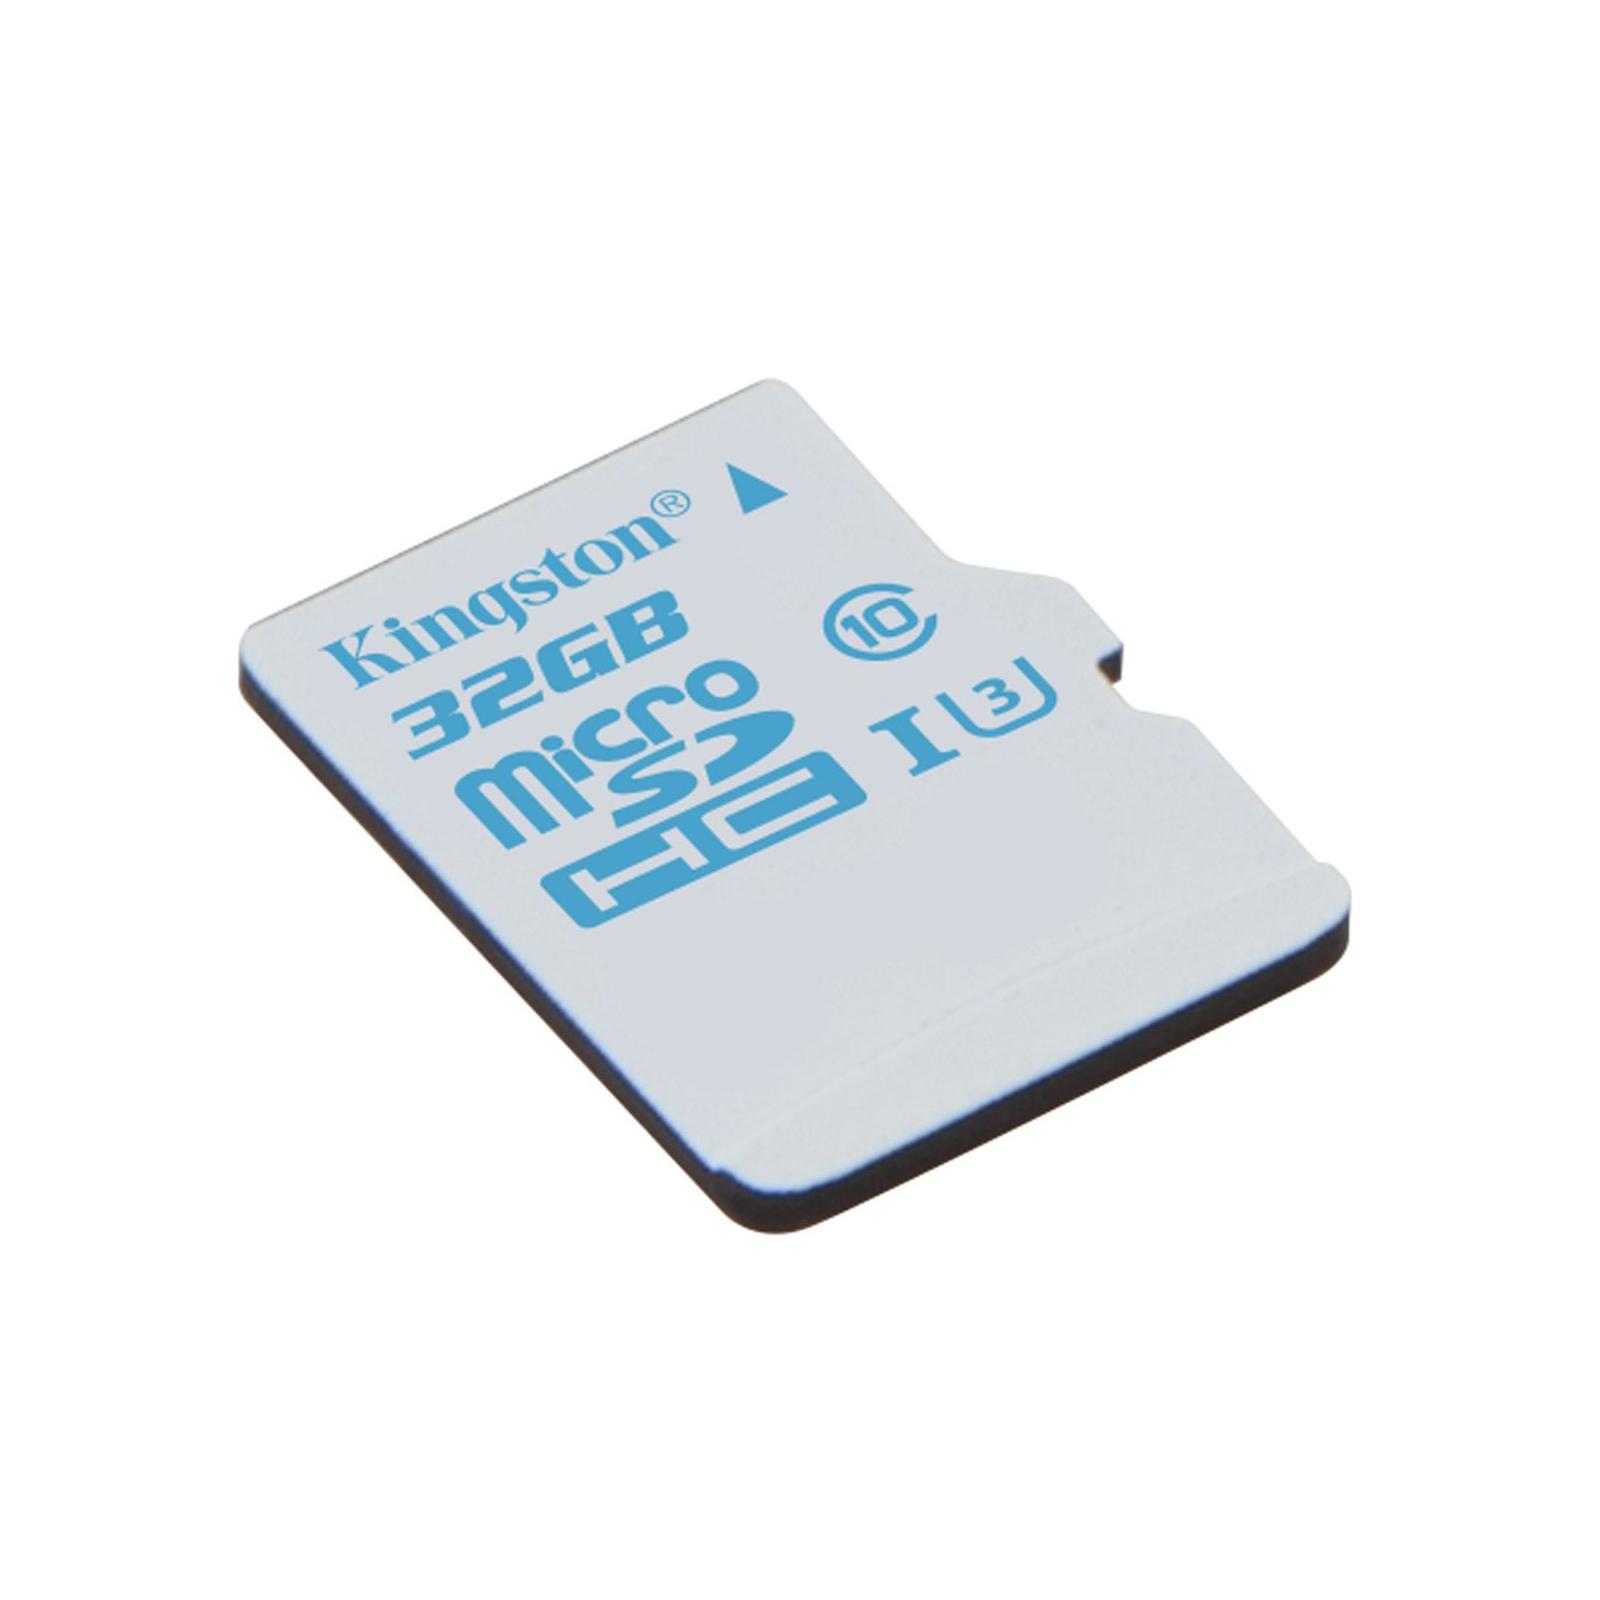 Карта памяти Kingston 32GB microSDHC class 10 UHS-I U3 (SDCAC/32GBSP) изображение 2